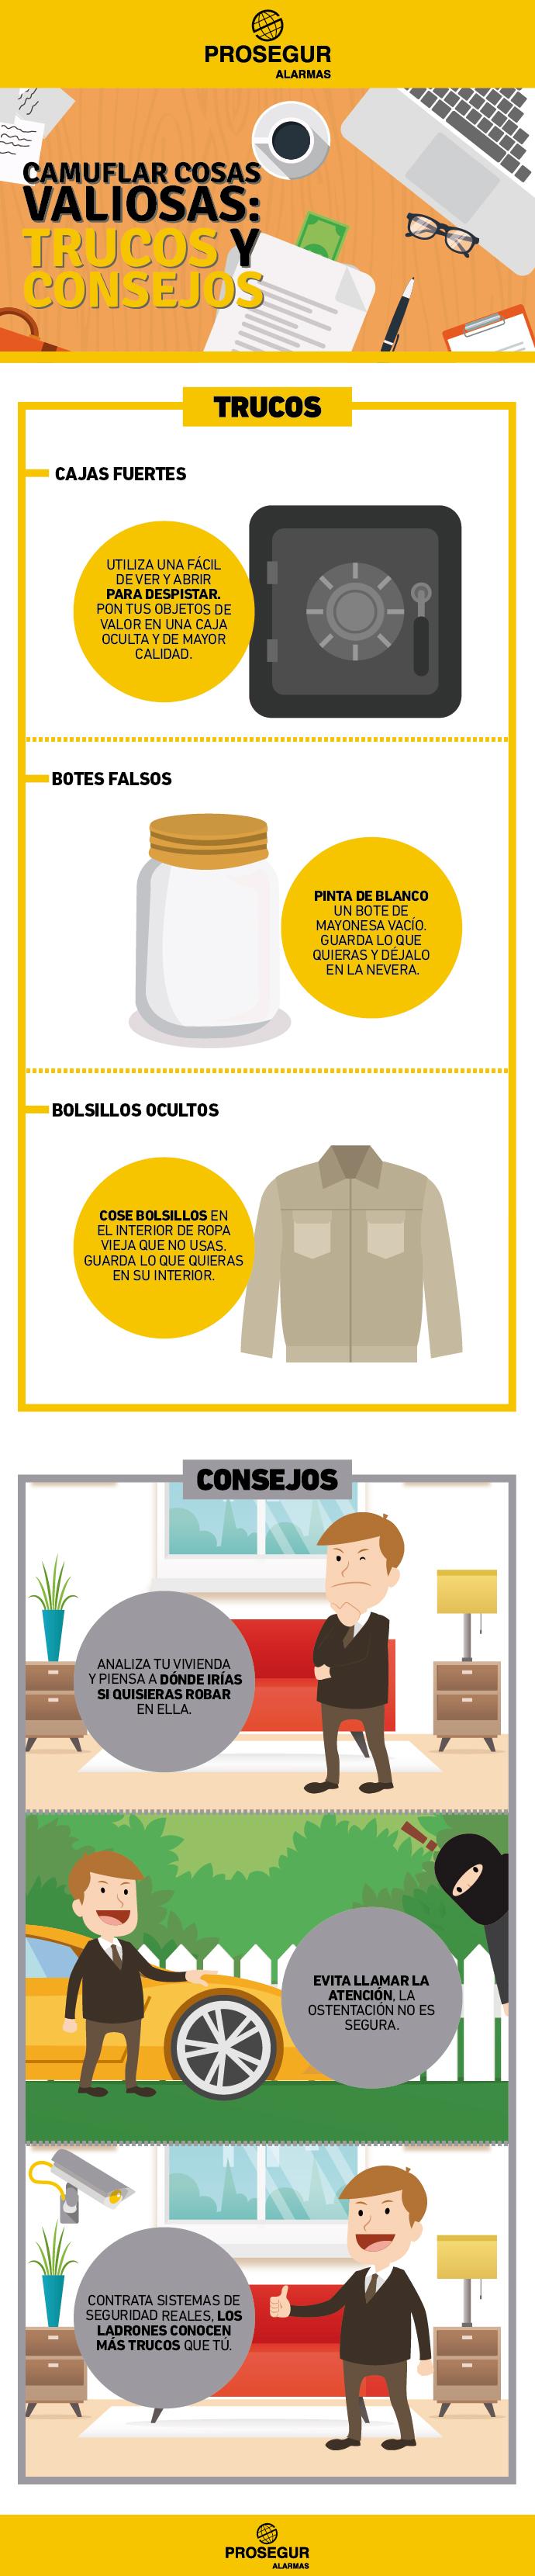 Camuflar cosas valiosas - Trucos y consejos - Blog Prosegur.